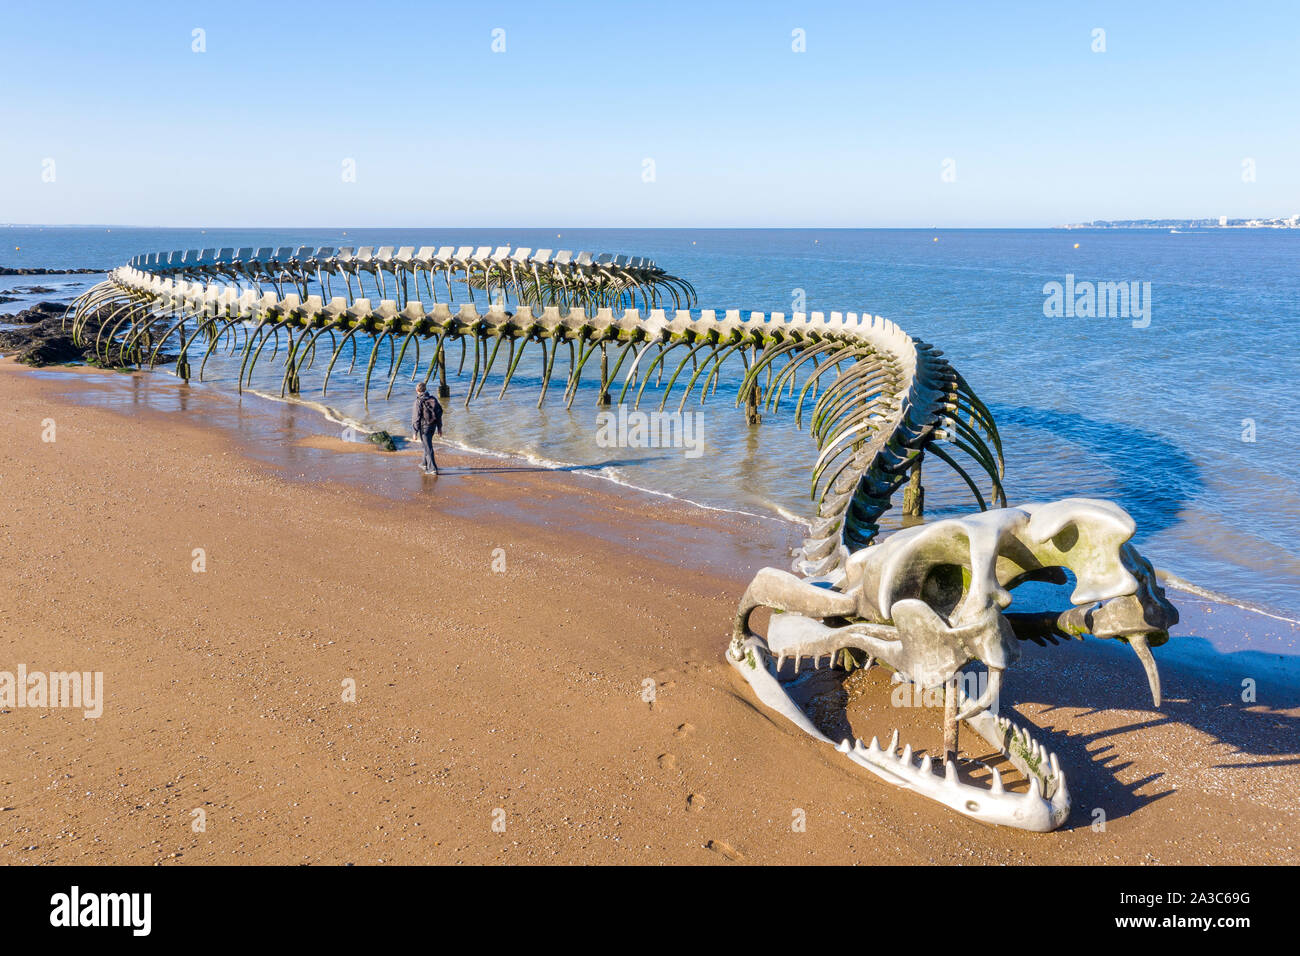 France, Loire Atlantique, Saint Brevin les Pins, Mindin, the Serpent d'Ocean (Ocean Serpent) monumental sculpture by Chinese artist Huang Yong Ping // Stock Photo